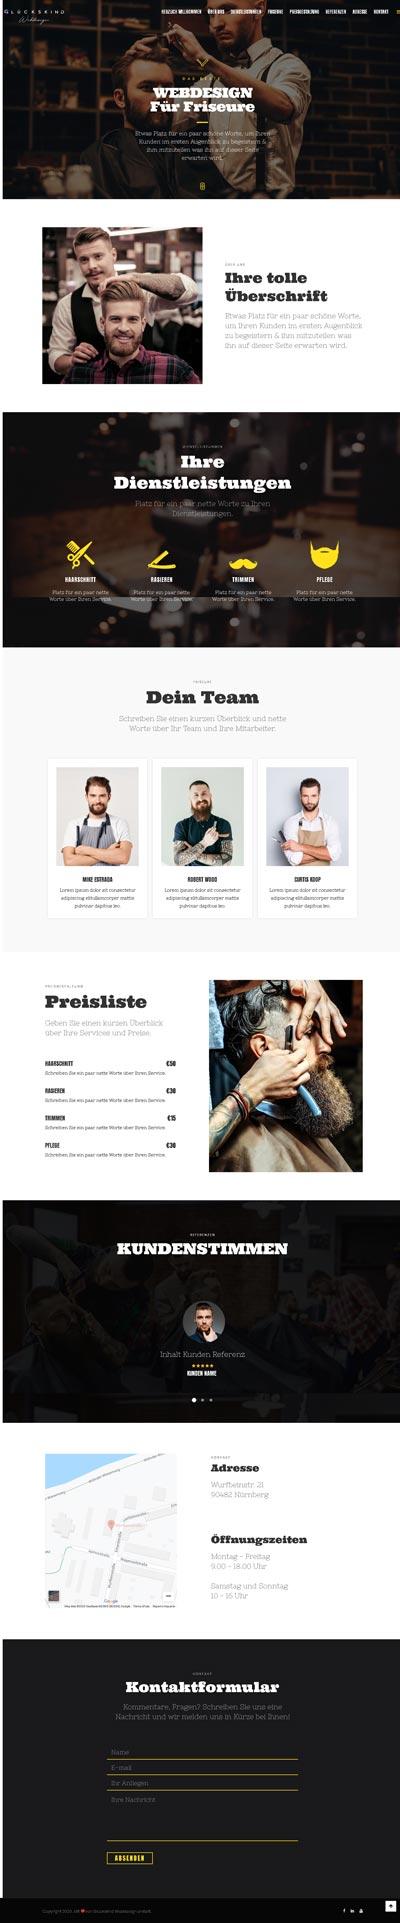 Friseur Mitchelll - Glückskind Webdesign Musterkatalog